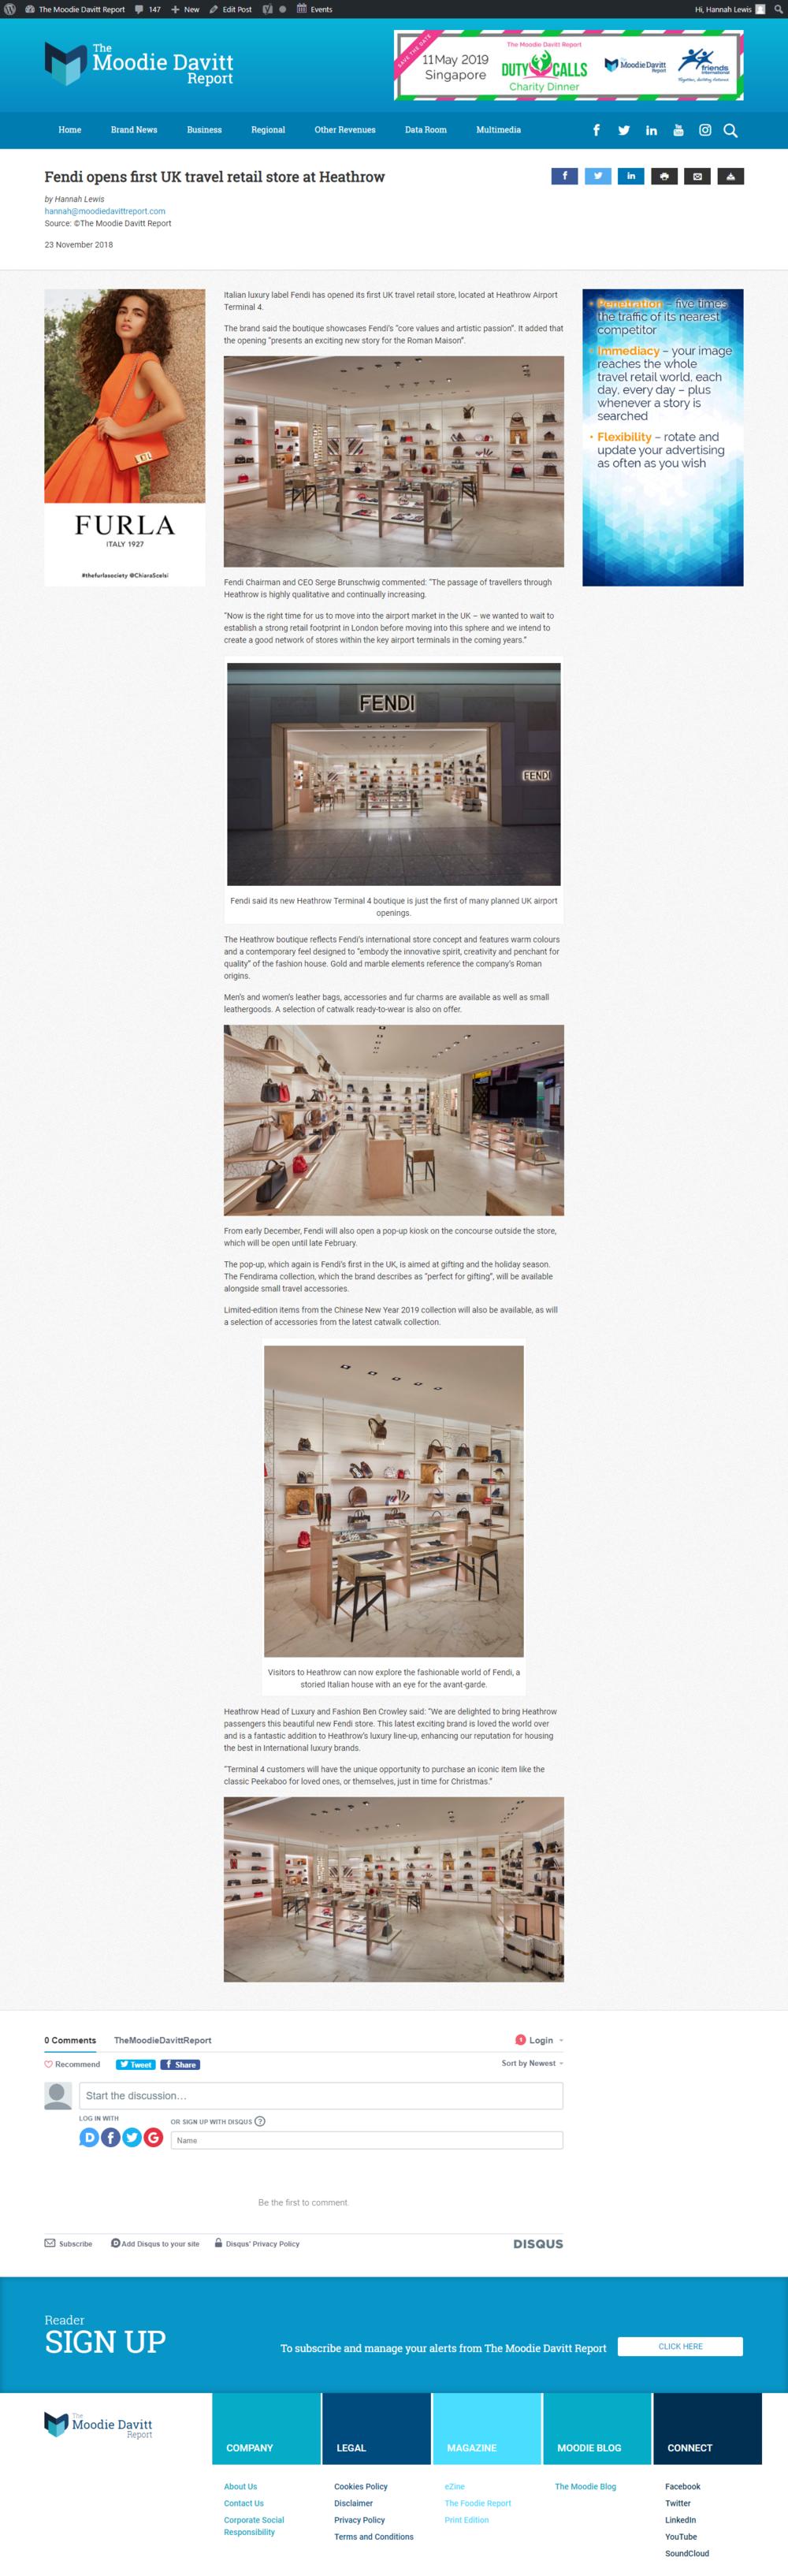 dbb370d0df25 Fendi opens first UK travel retail store at Heathrow — Hannah Lewis